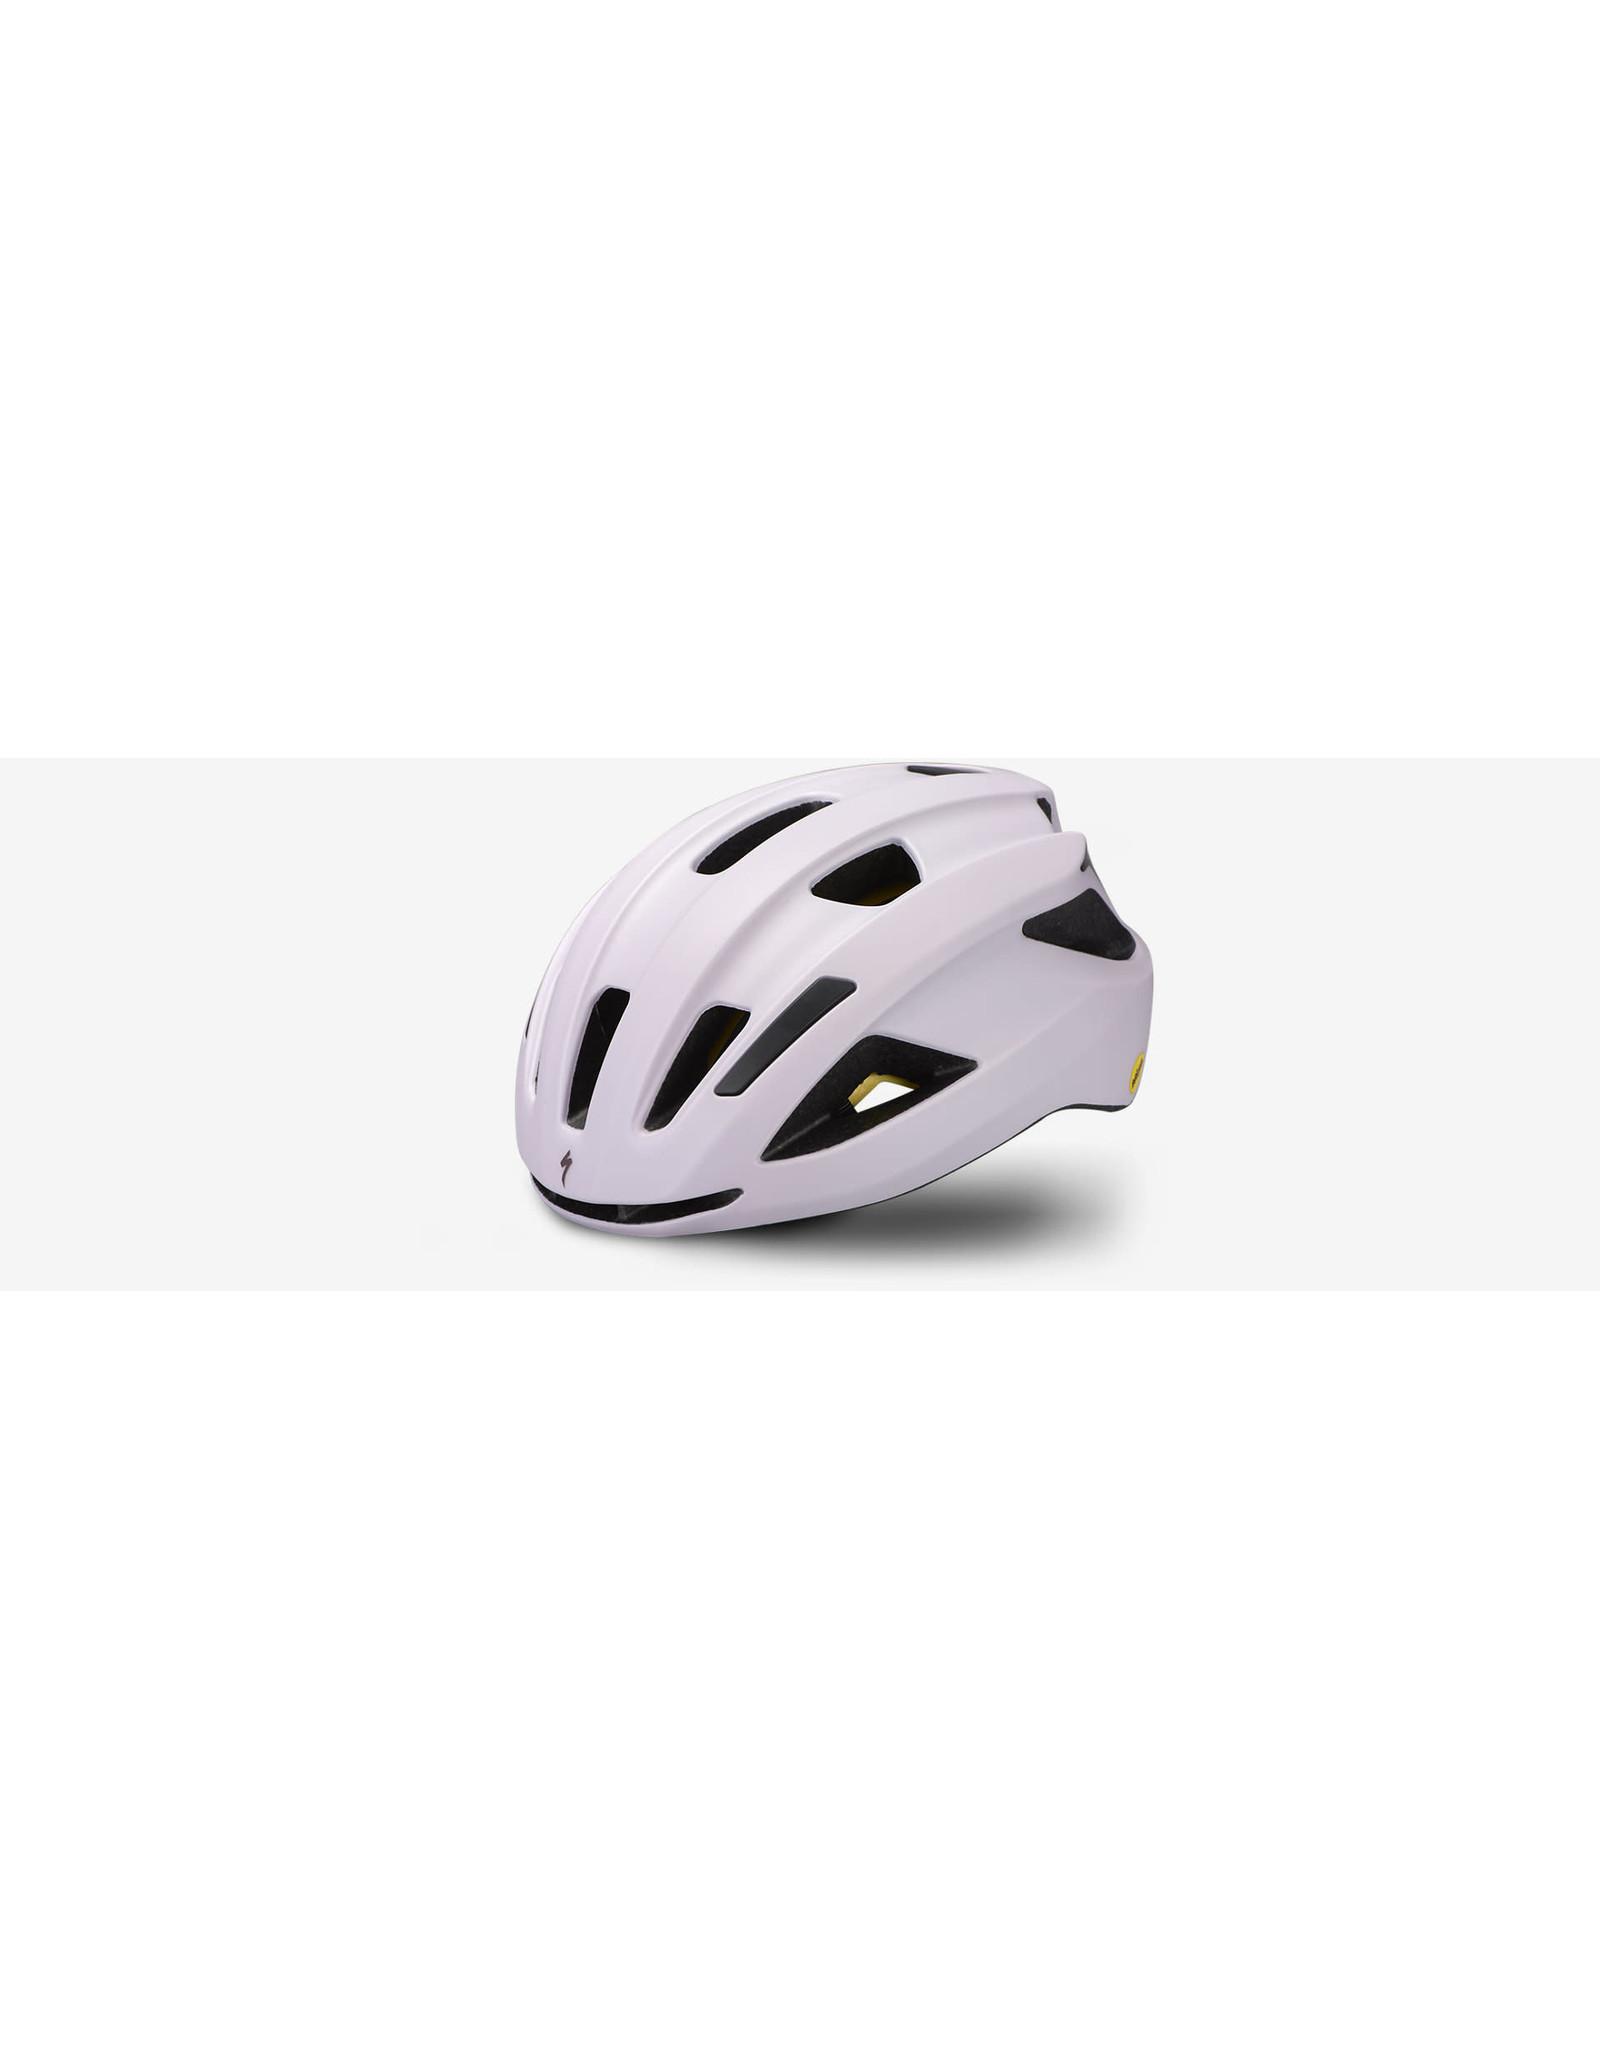 Specialized Helmet Spec Align MIPS Cly/Cstumbr S/M